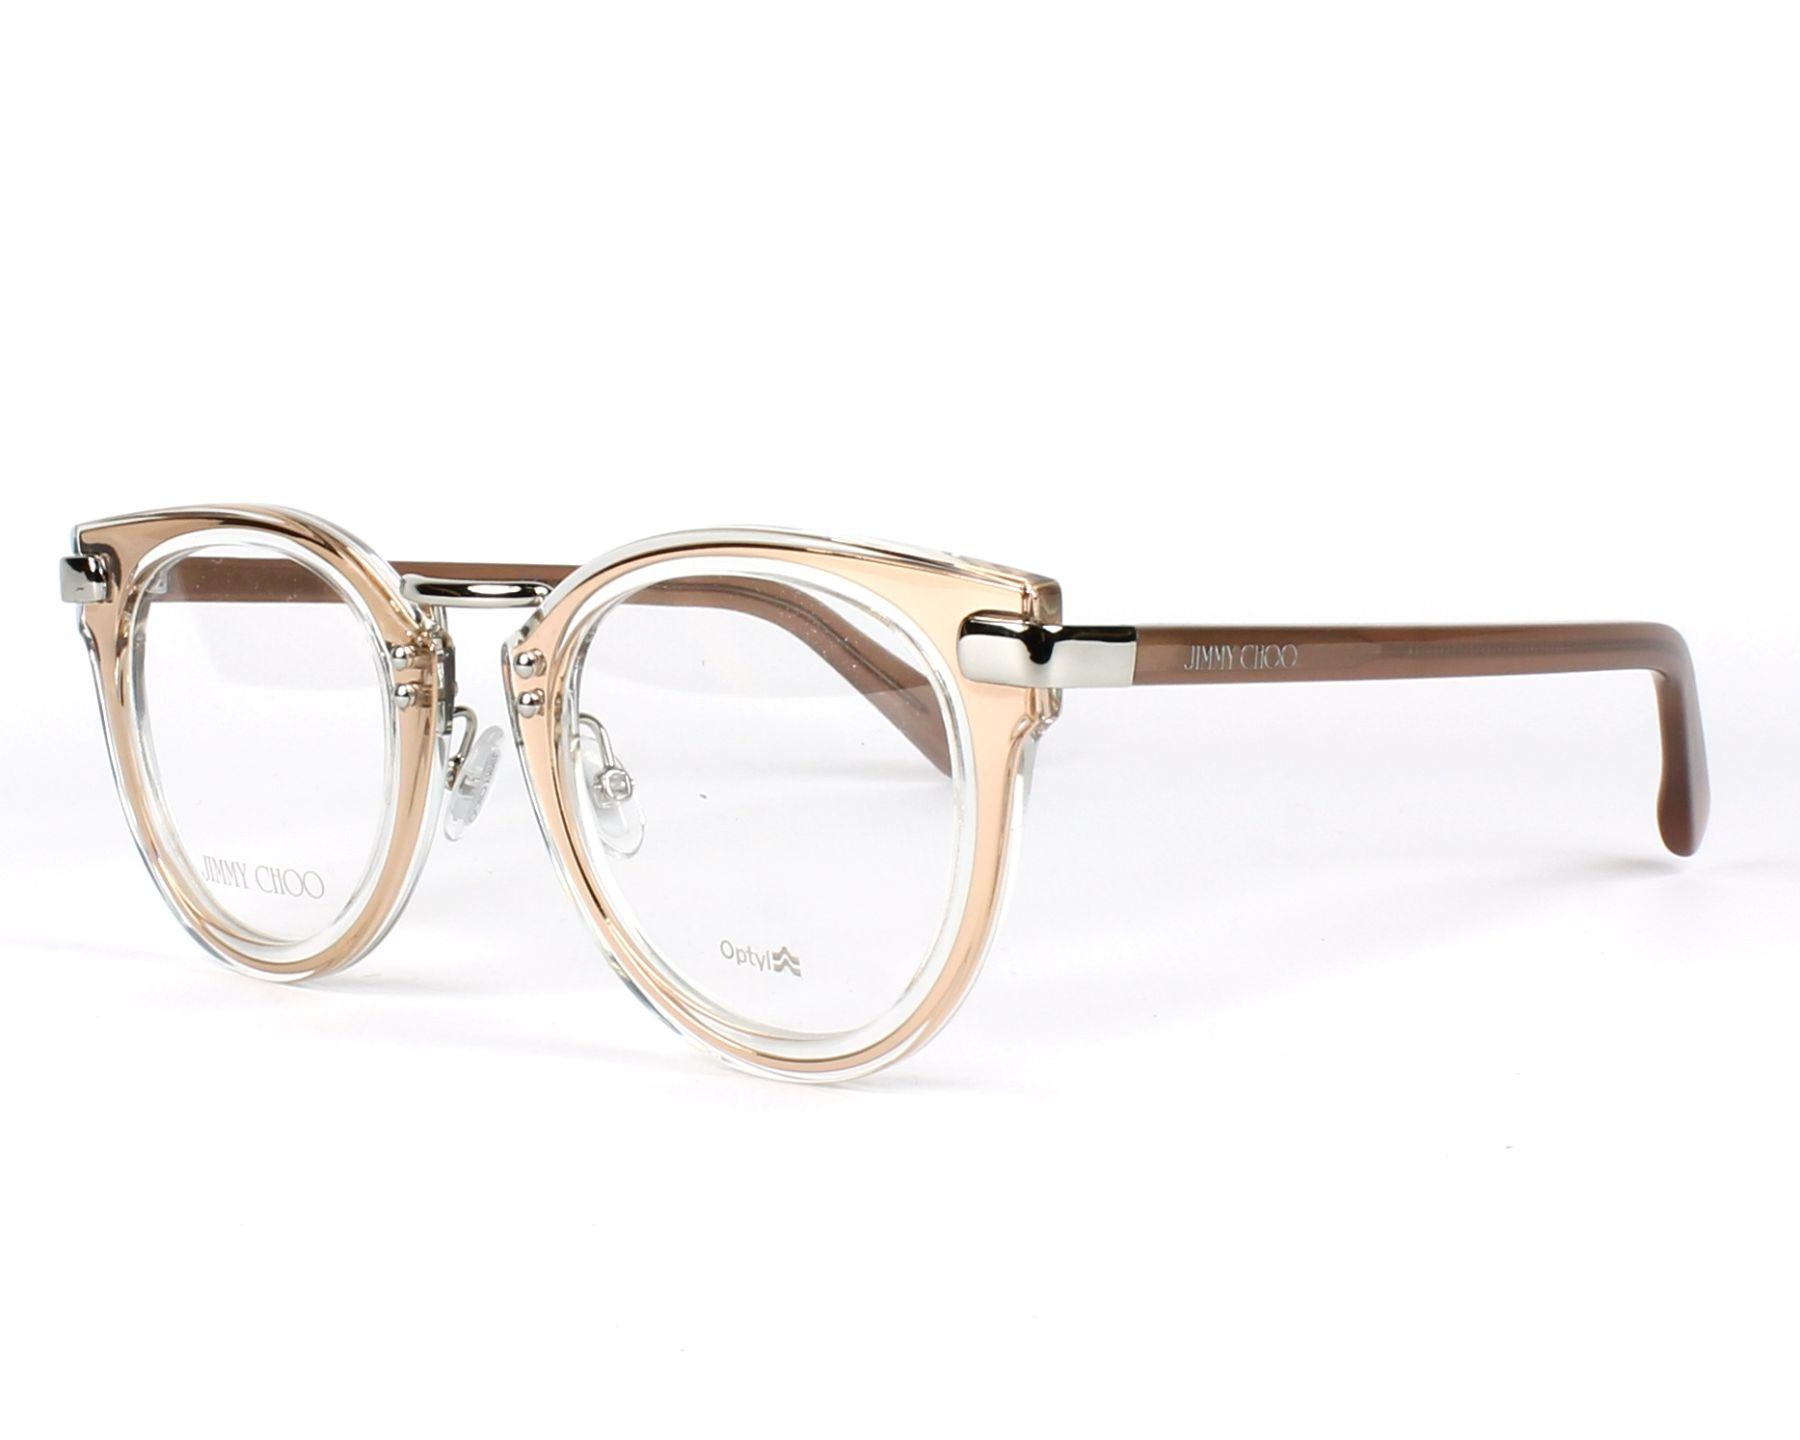 acheter des lunettes de vue jimmy choo jc 183 13b visionet. Black Bedroom Furniture Sets. Home Design Ideas